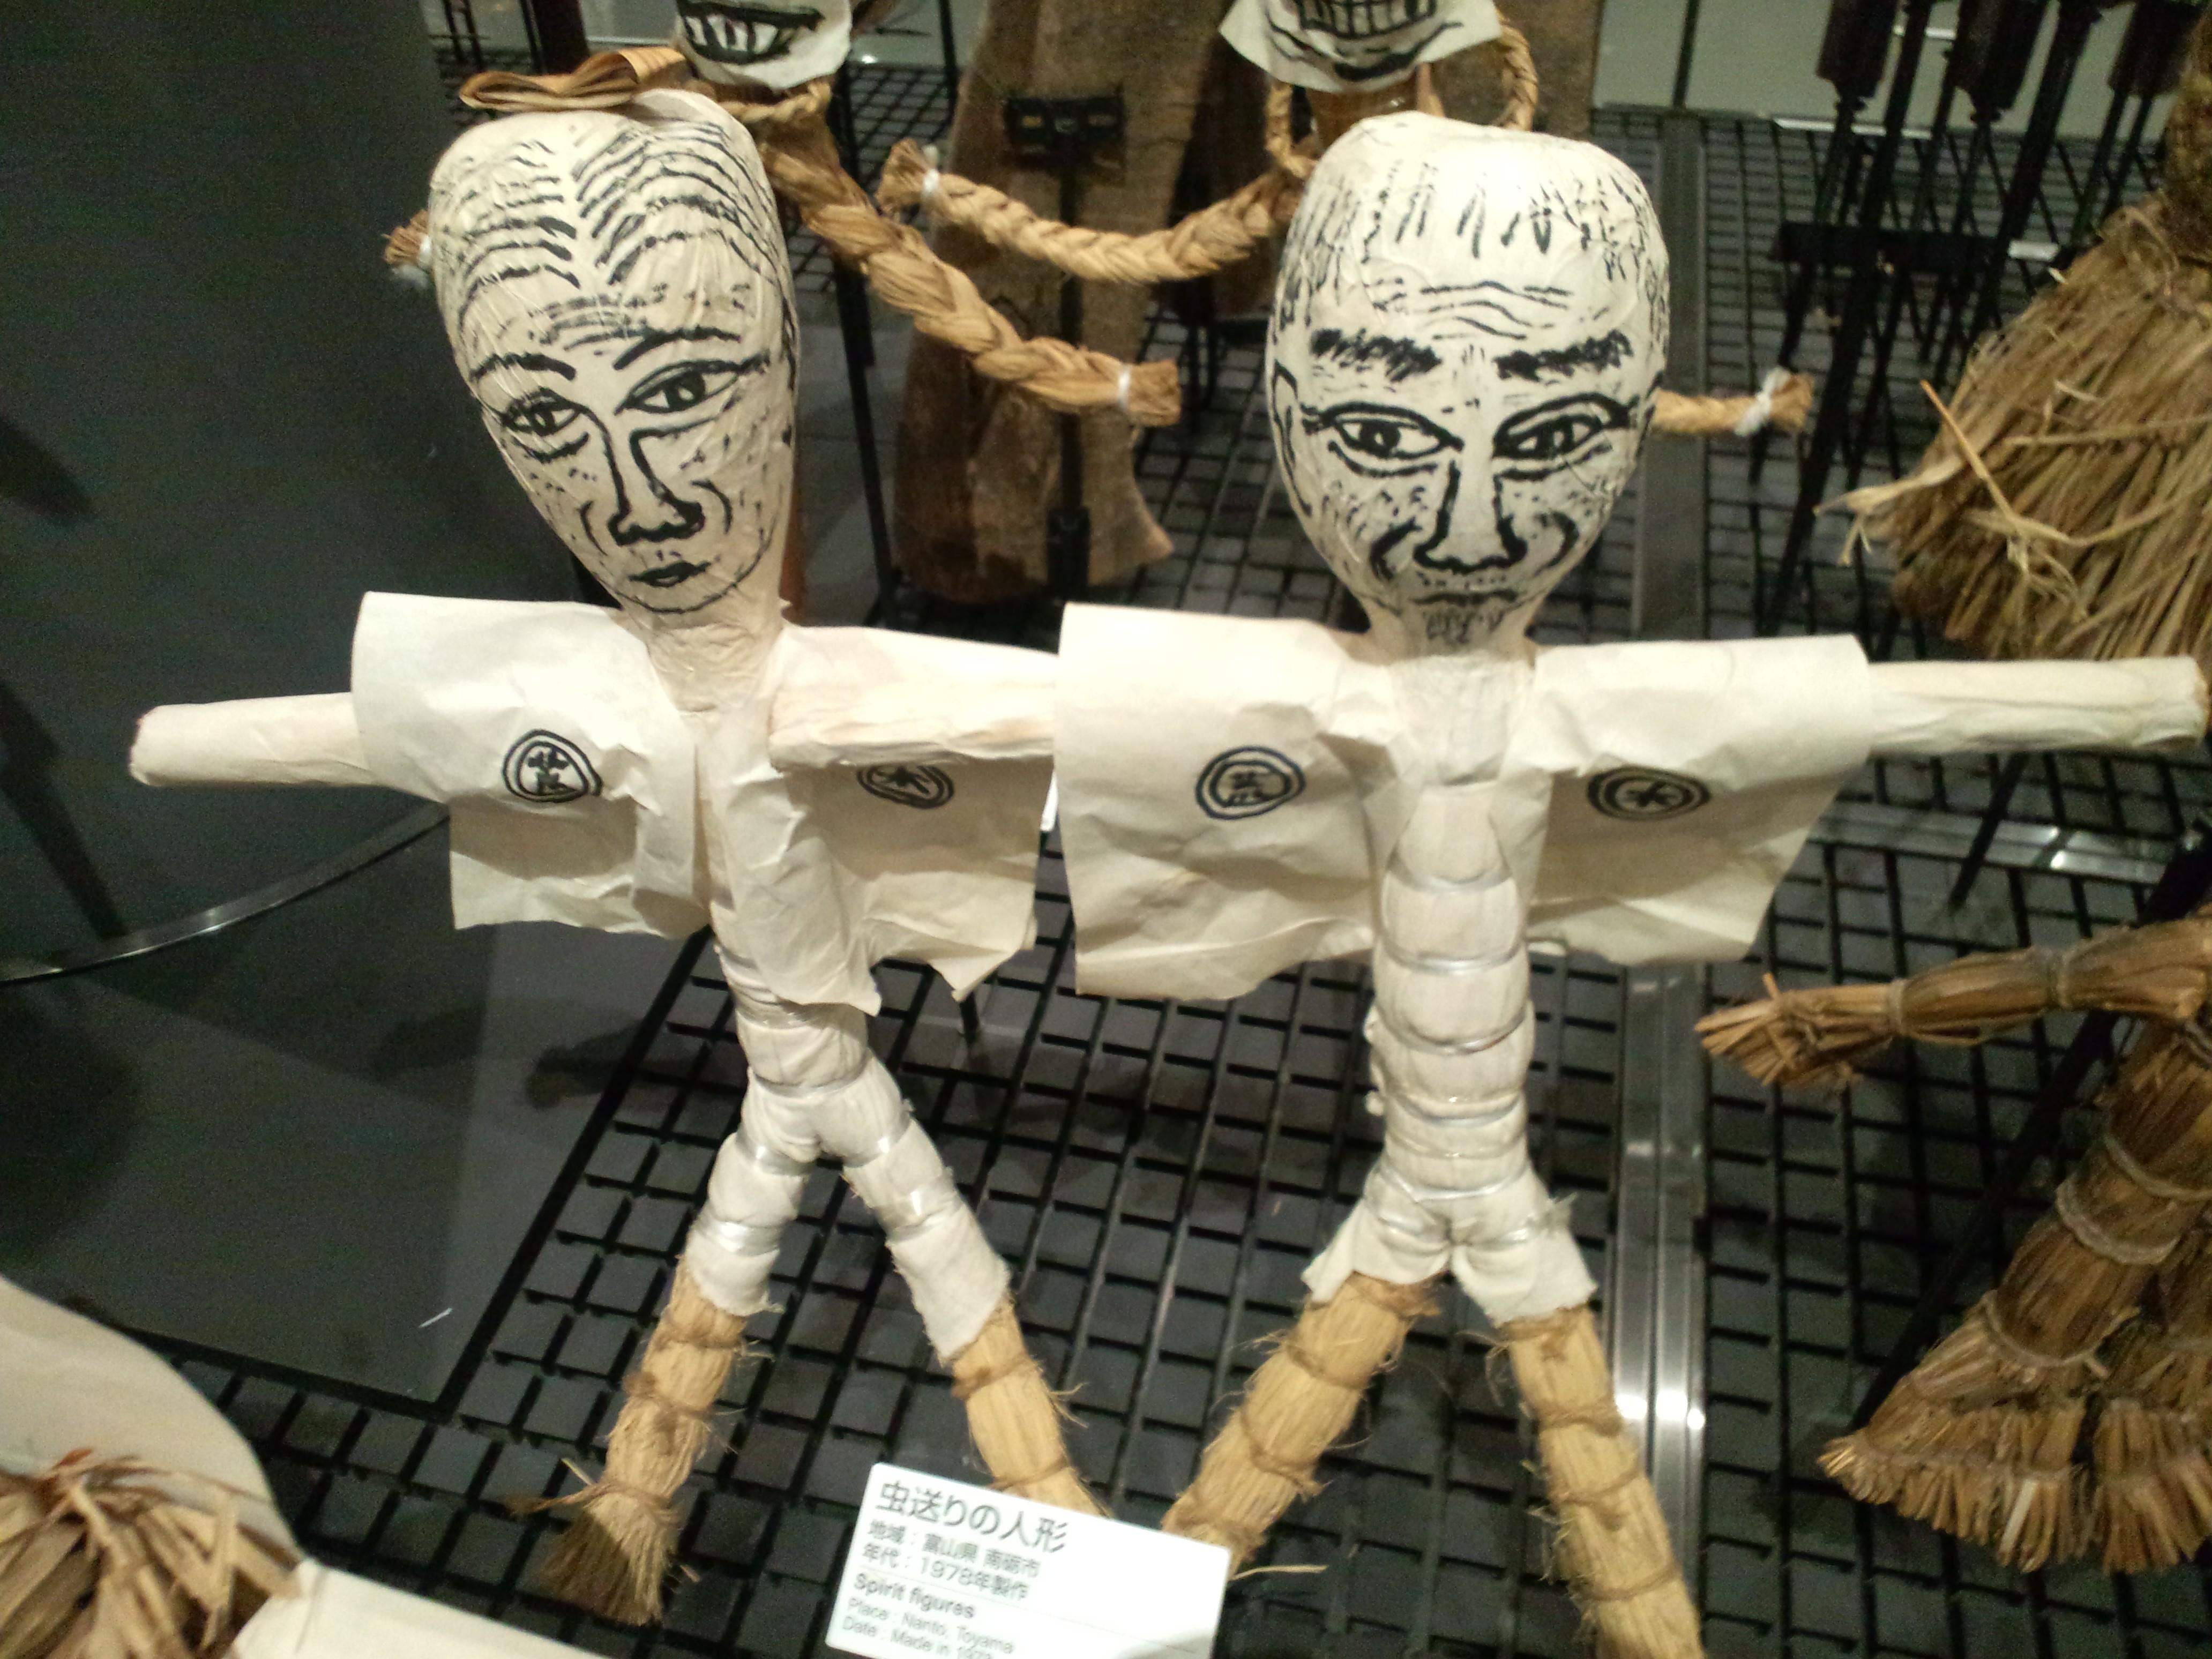 National_Museum_of_Ethnology%2C_Osaka_-_Spirit_figures_%28Mushiokuri-no-Ningyô%29_-_Nanto_City%2C_Toyama_Pref._-_Made_in_1978.jpg